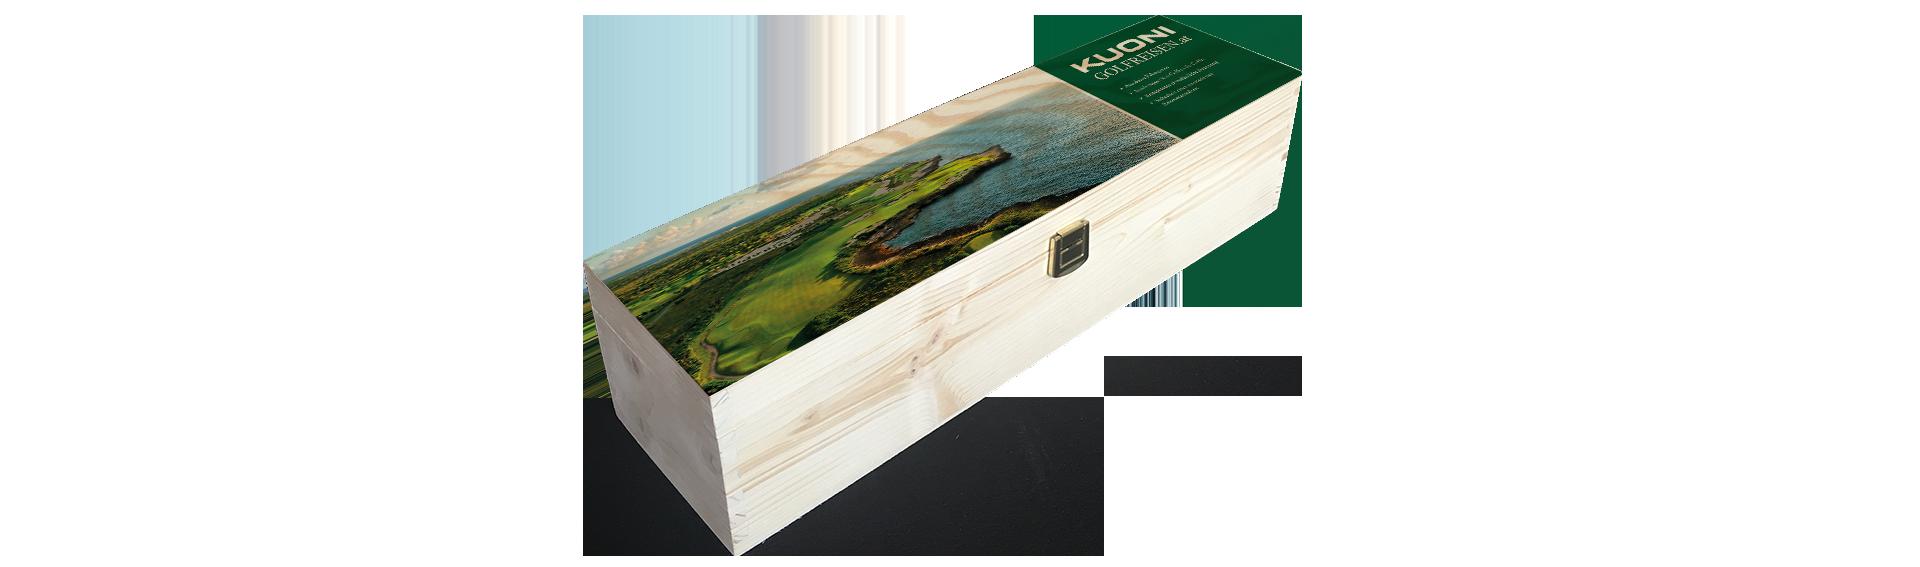 Kuoni Golfreisen | Holzkiste Weinkiste bedruckt